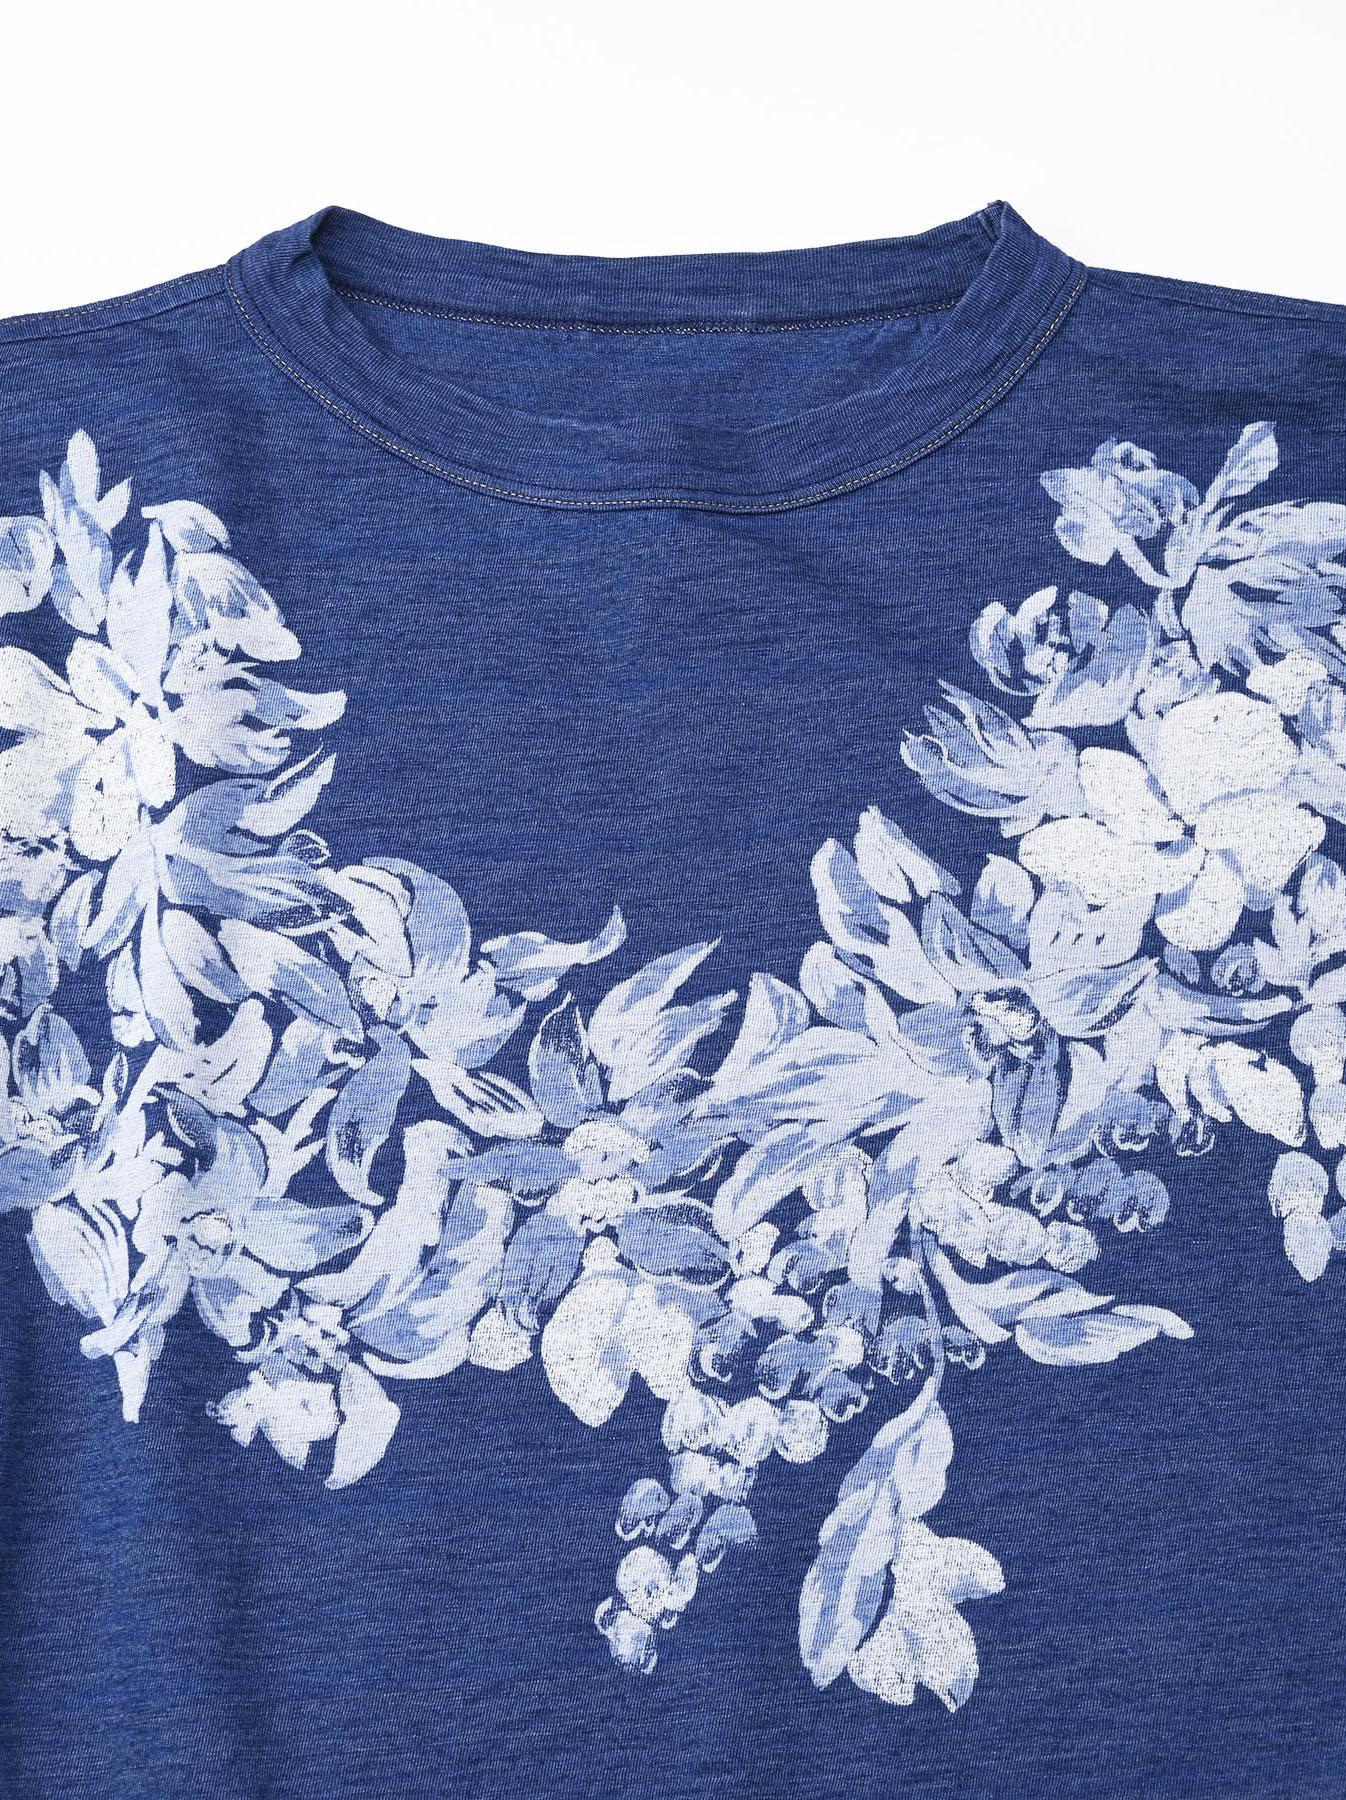 Distressed Indigo Lei Lei Print Big Slit T-shirt (0621)-7